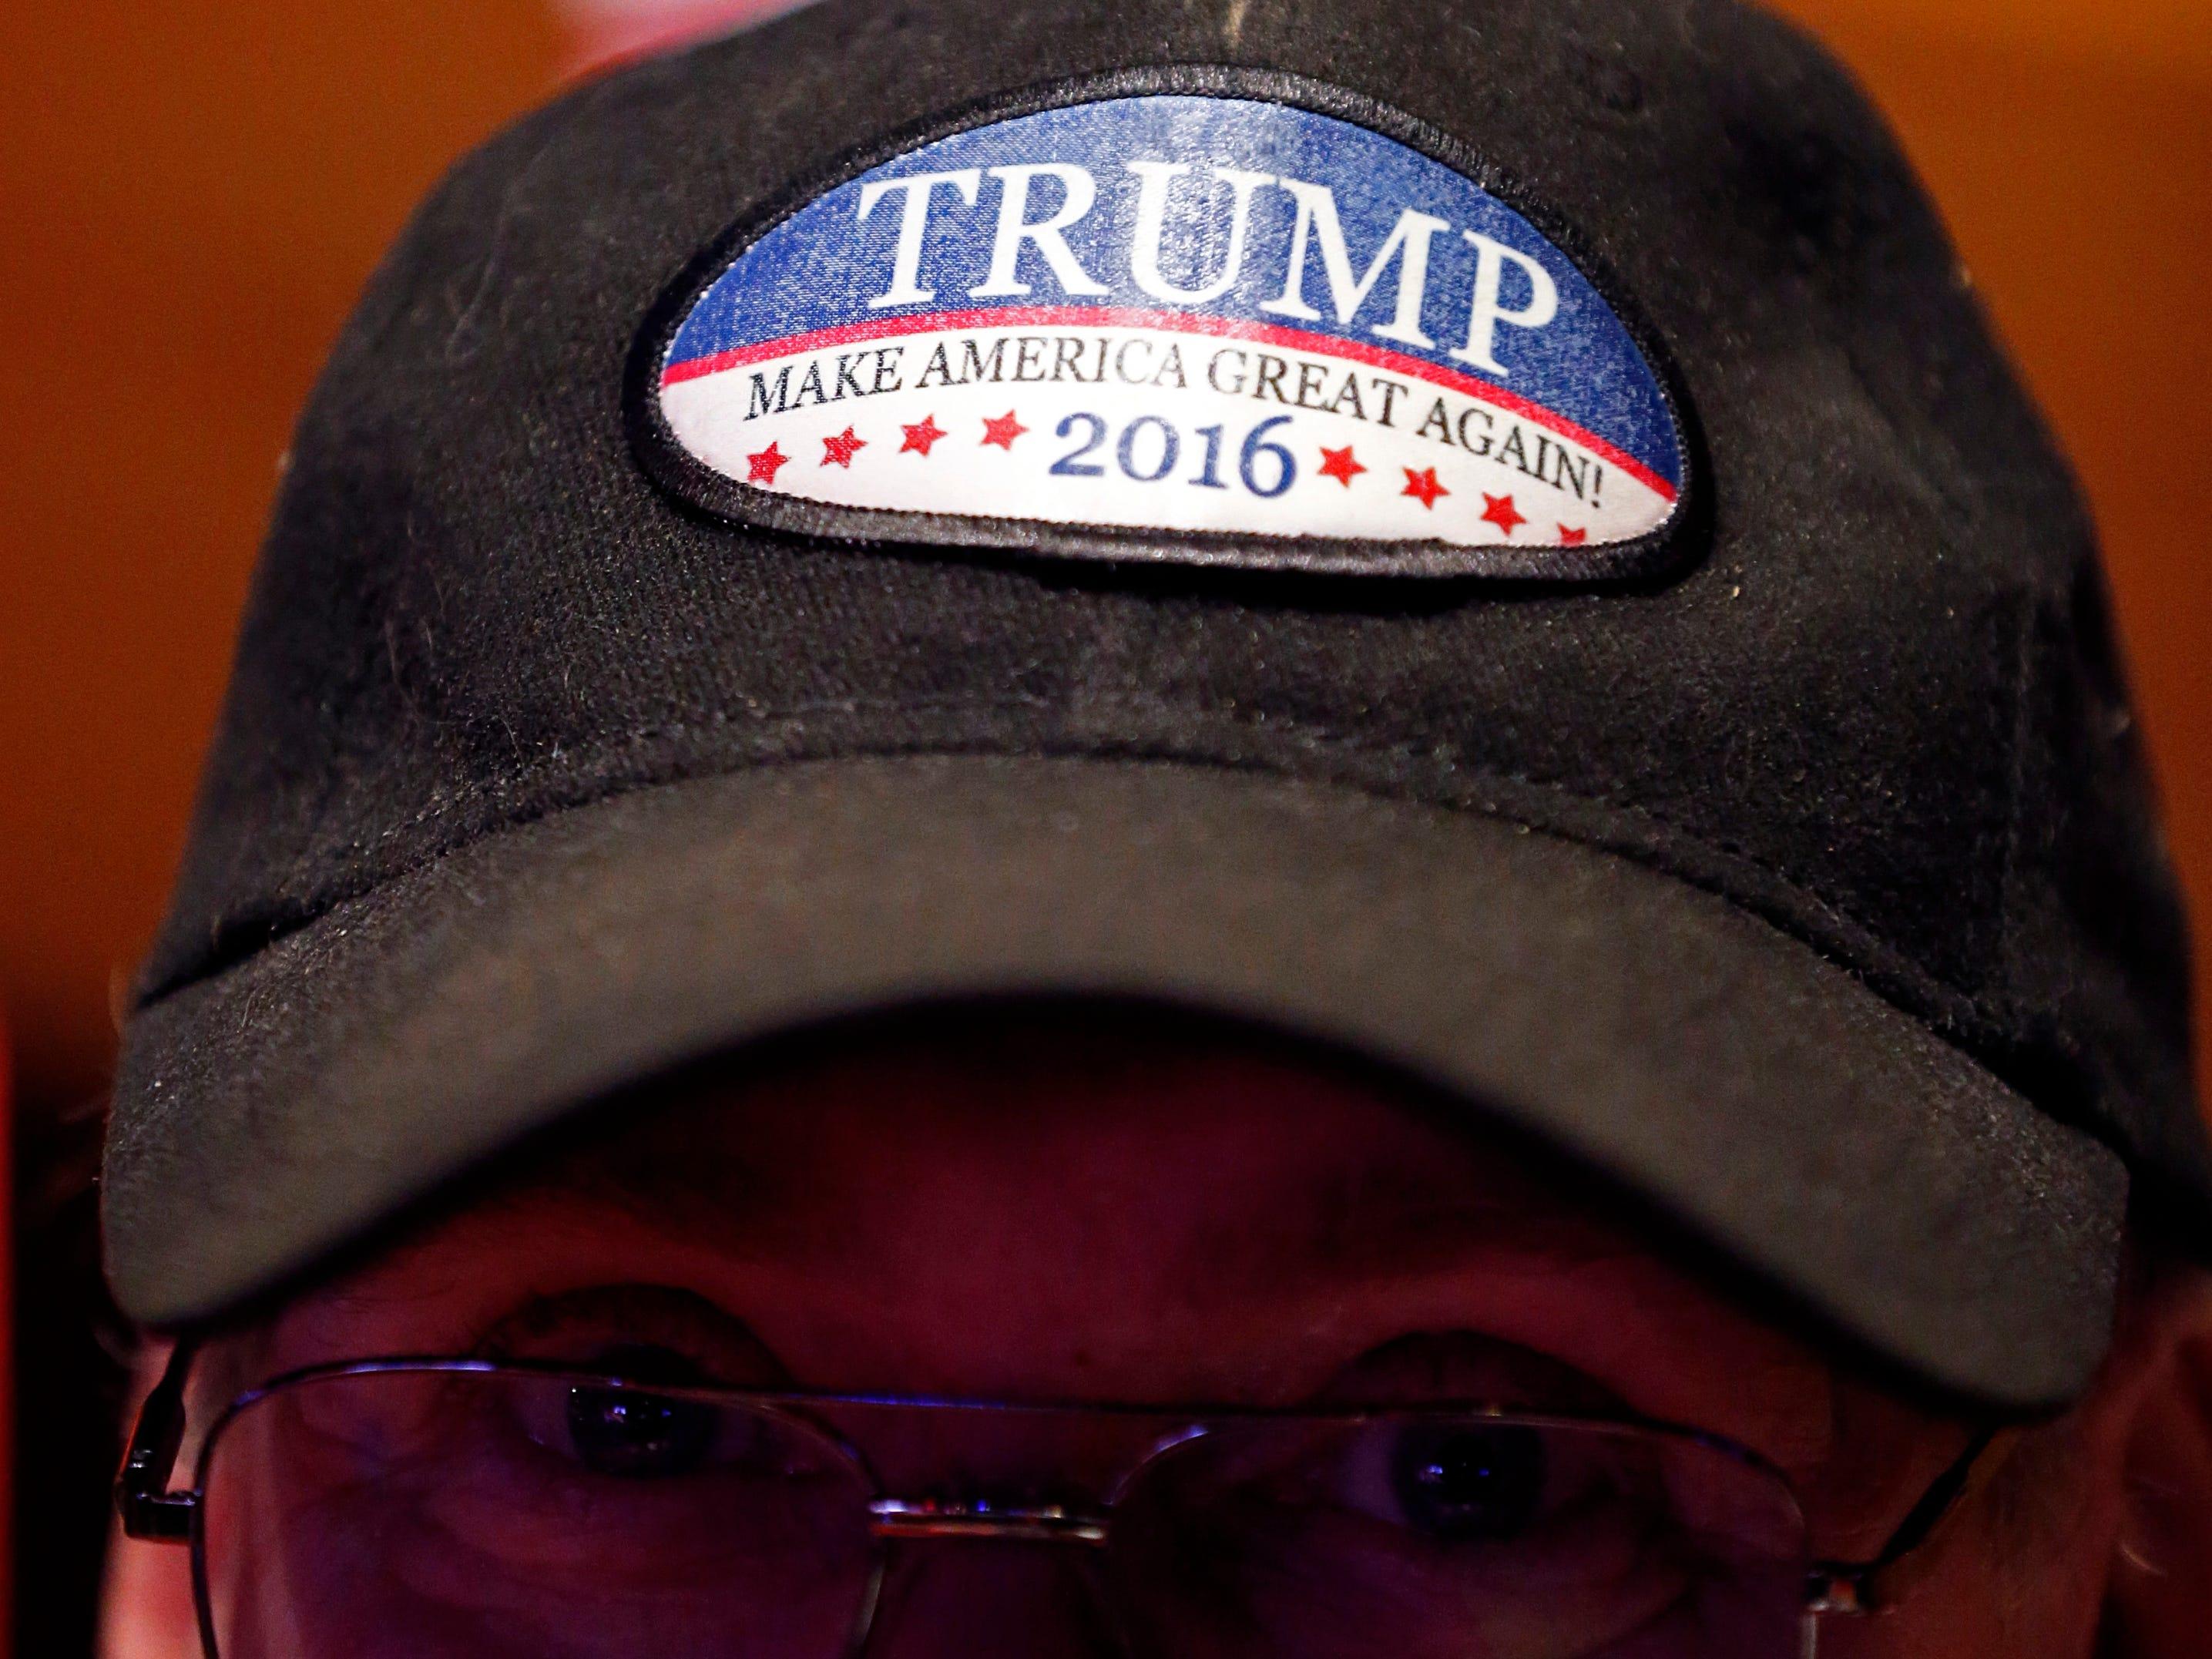 David Blair of Hendersonville, Tenn., wears a Trump hat during a campaign event for Republican U.S. Senate candidate Marsha Blackburn Sunday, Oct. 28, 2018, in Nashville, Tenn.